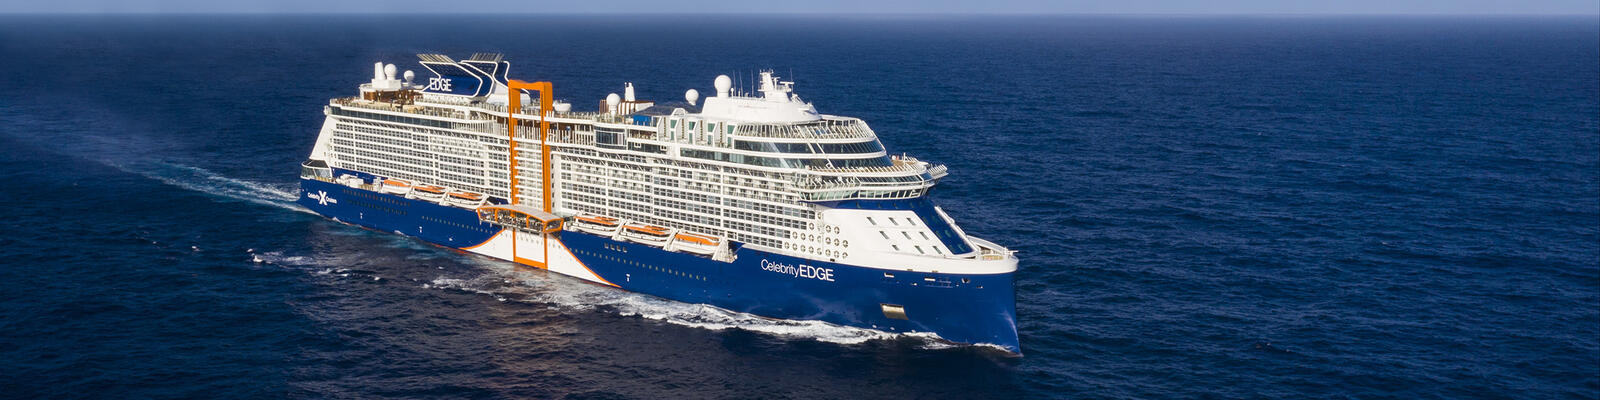 cruise reviews cruise deals